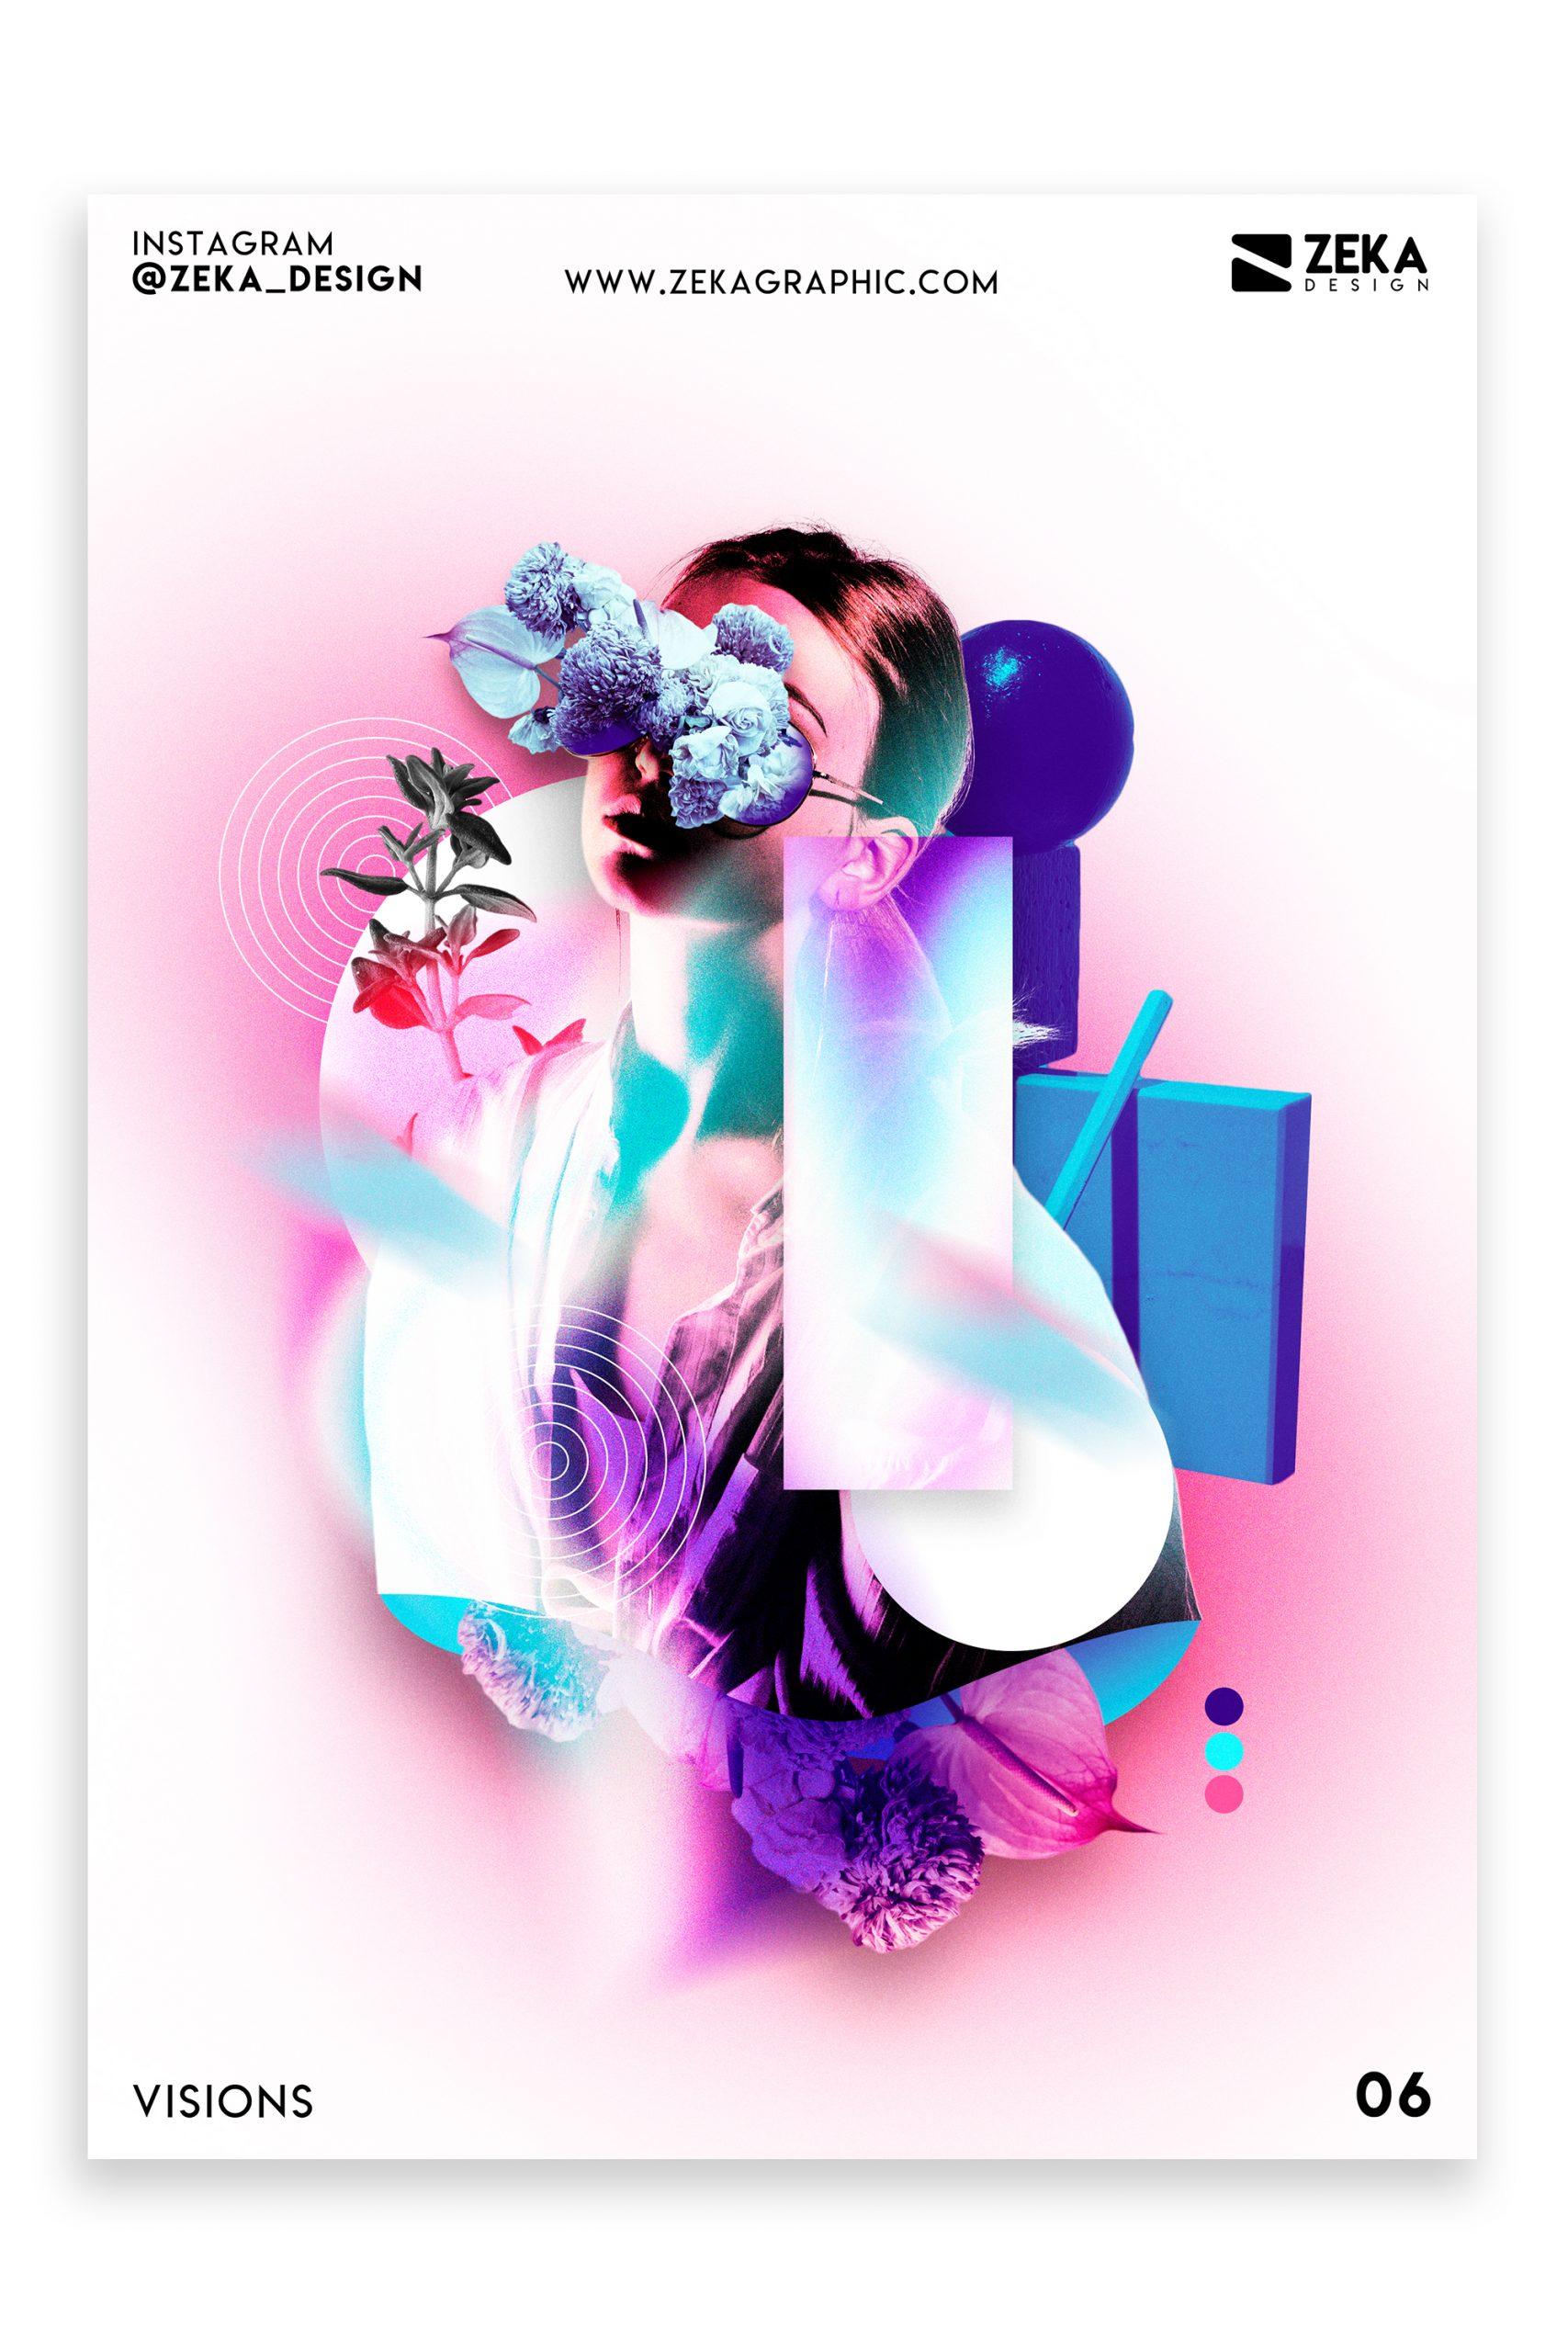 Visions Poster Design Inspiration Zeka Design Graphic Design Portfolio 6